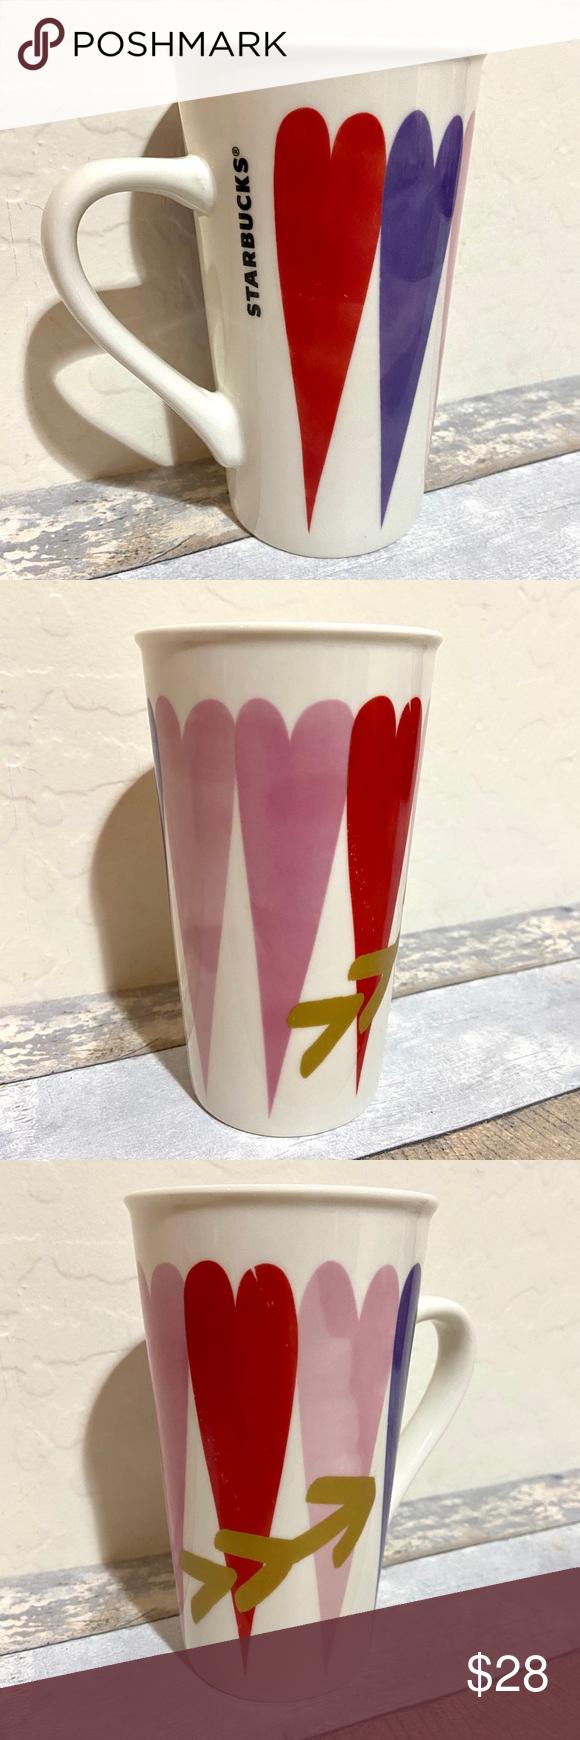 Starbucks 2017 Limited Edition Hearts Coffee Mug in 2020